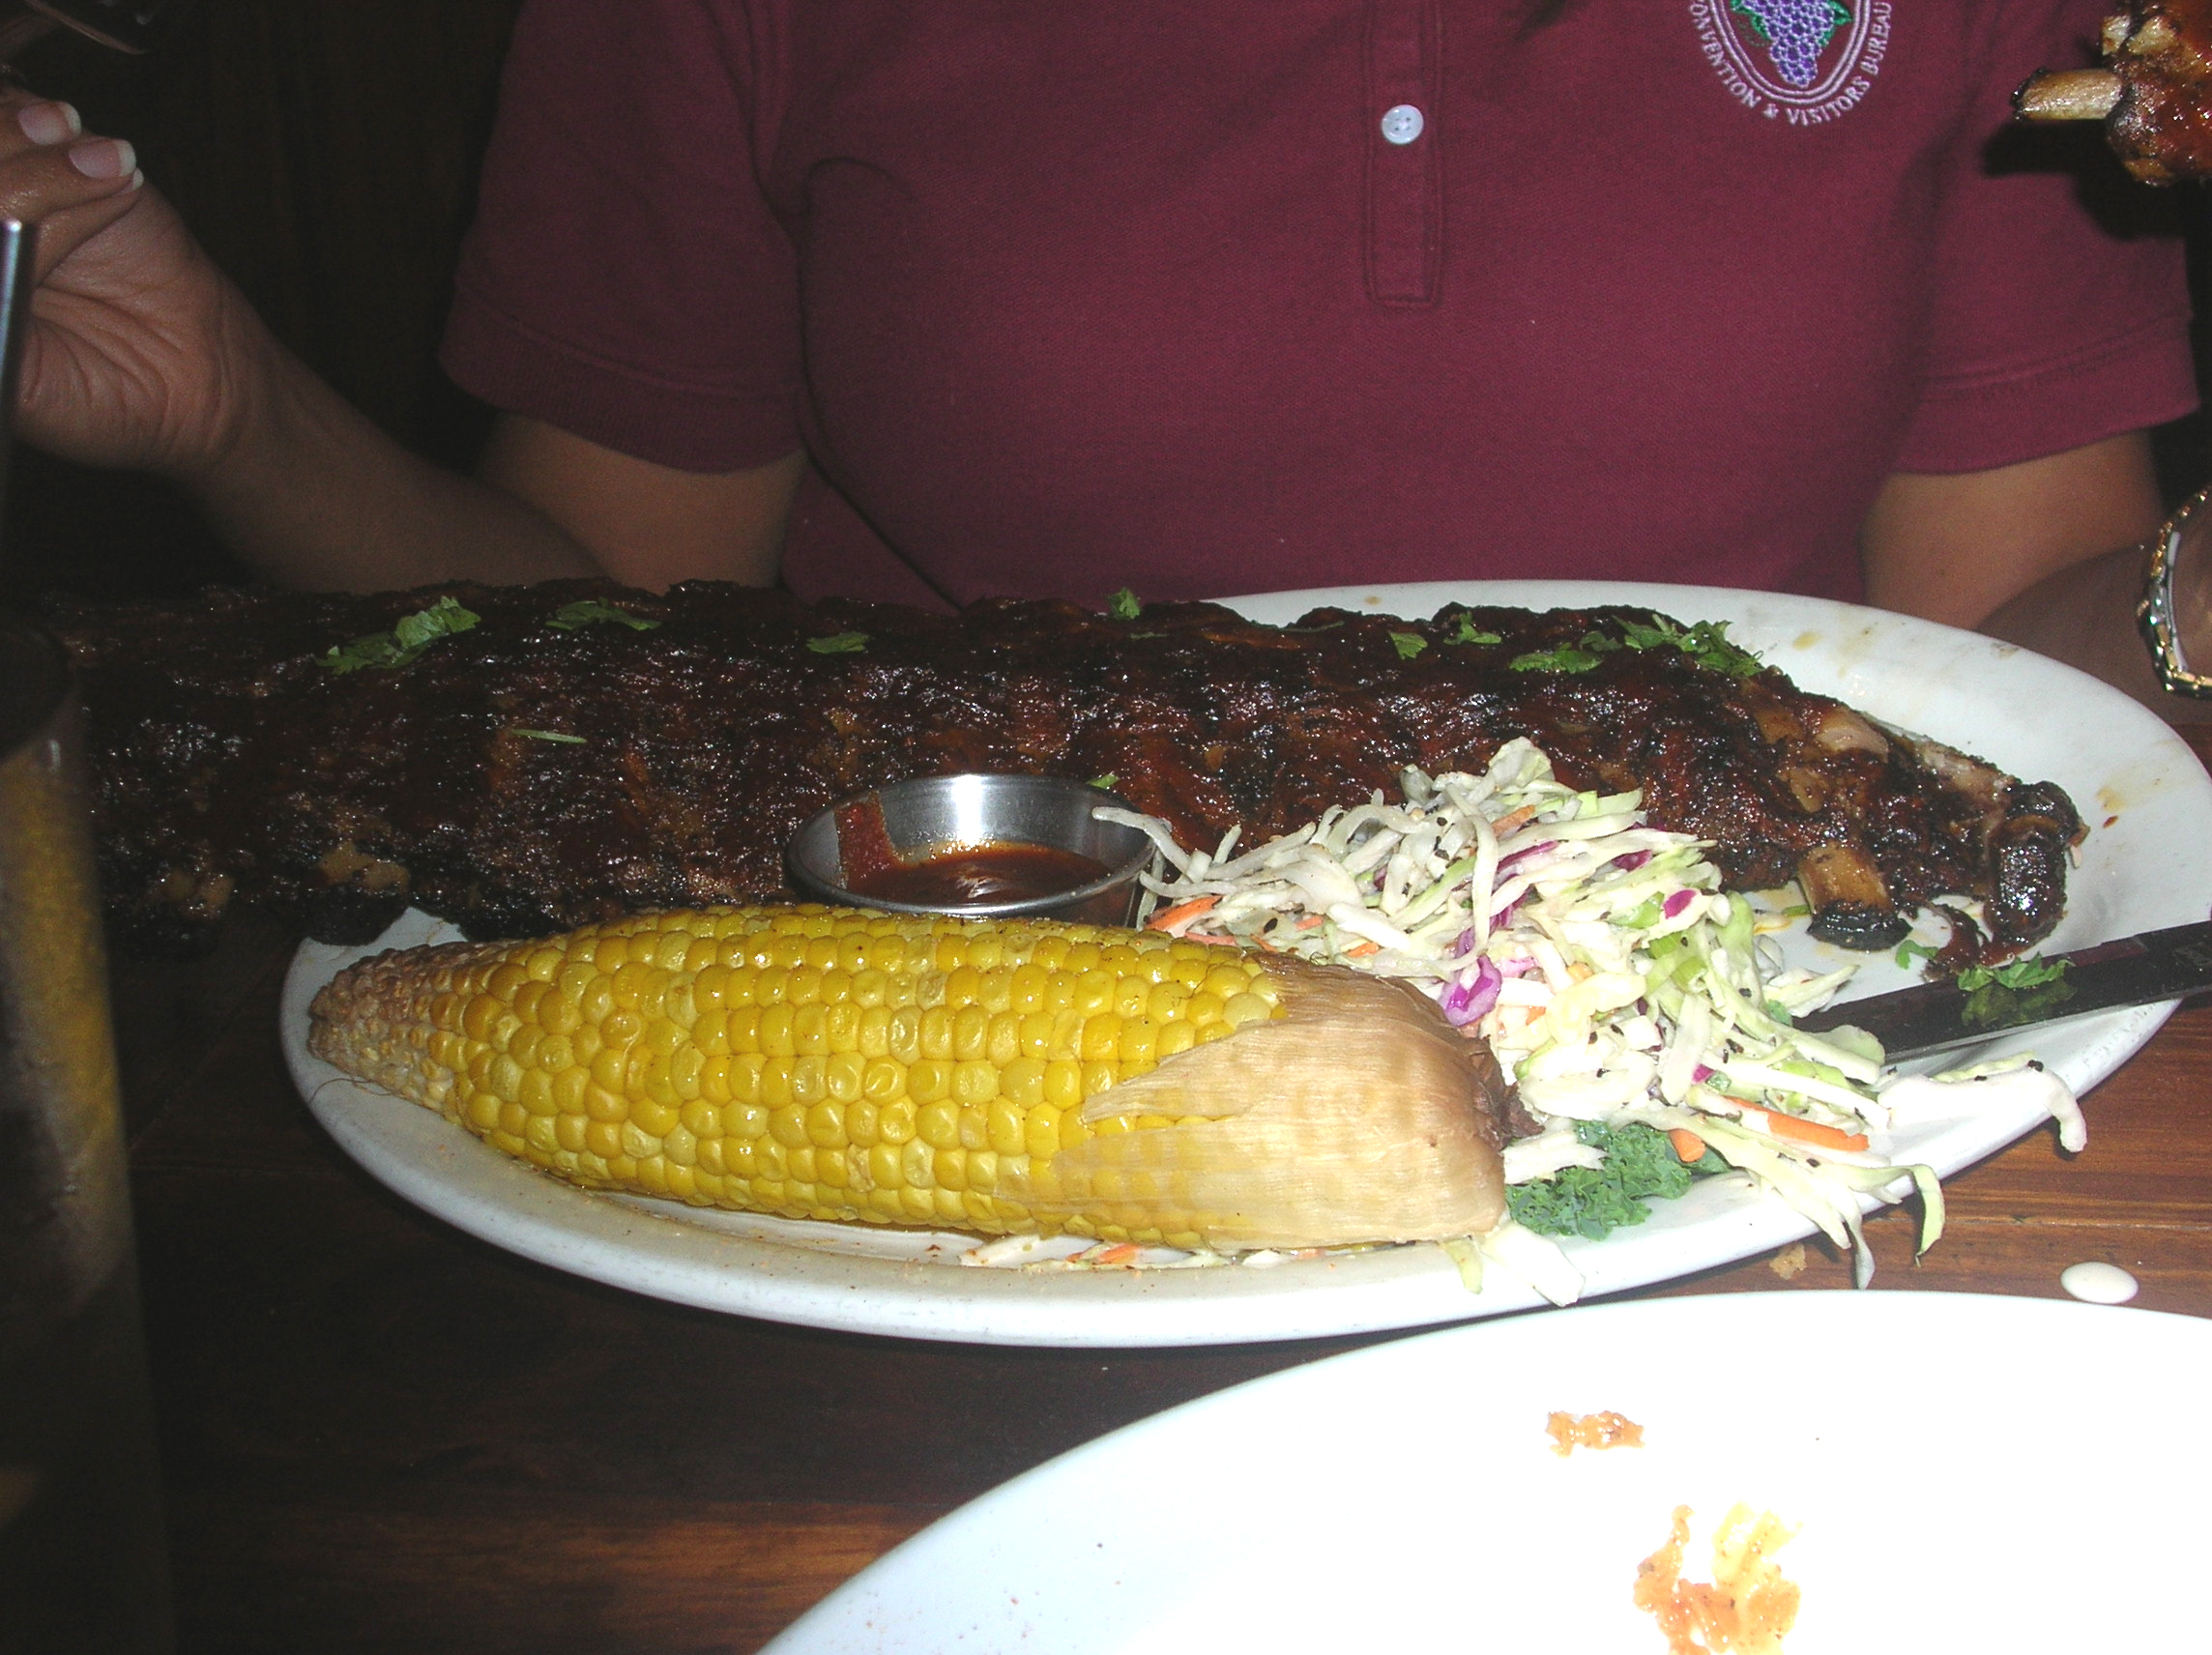 Texas: Barbecue, Chili y Tex-Mex